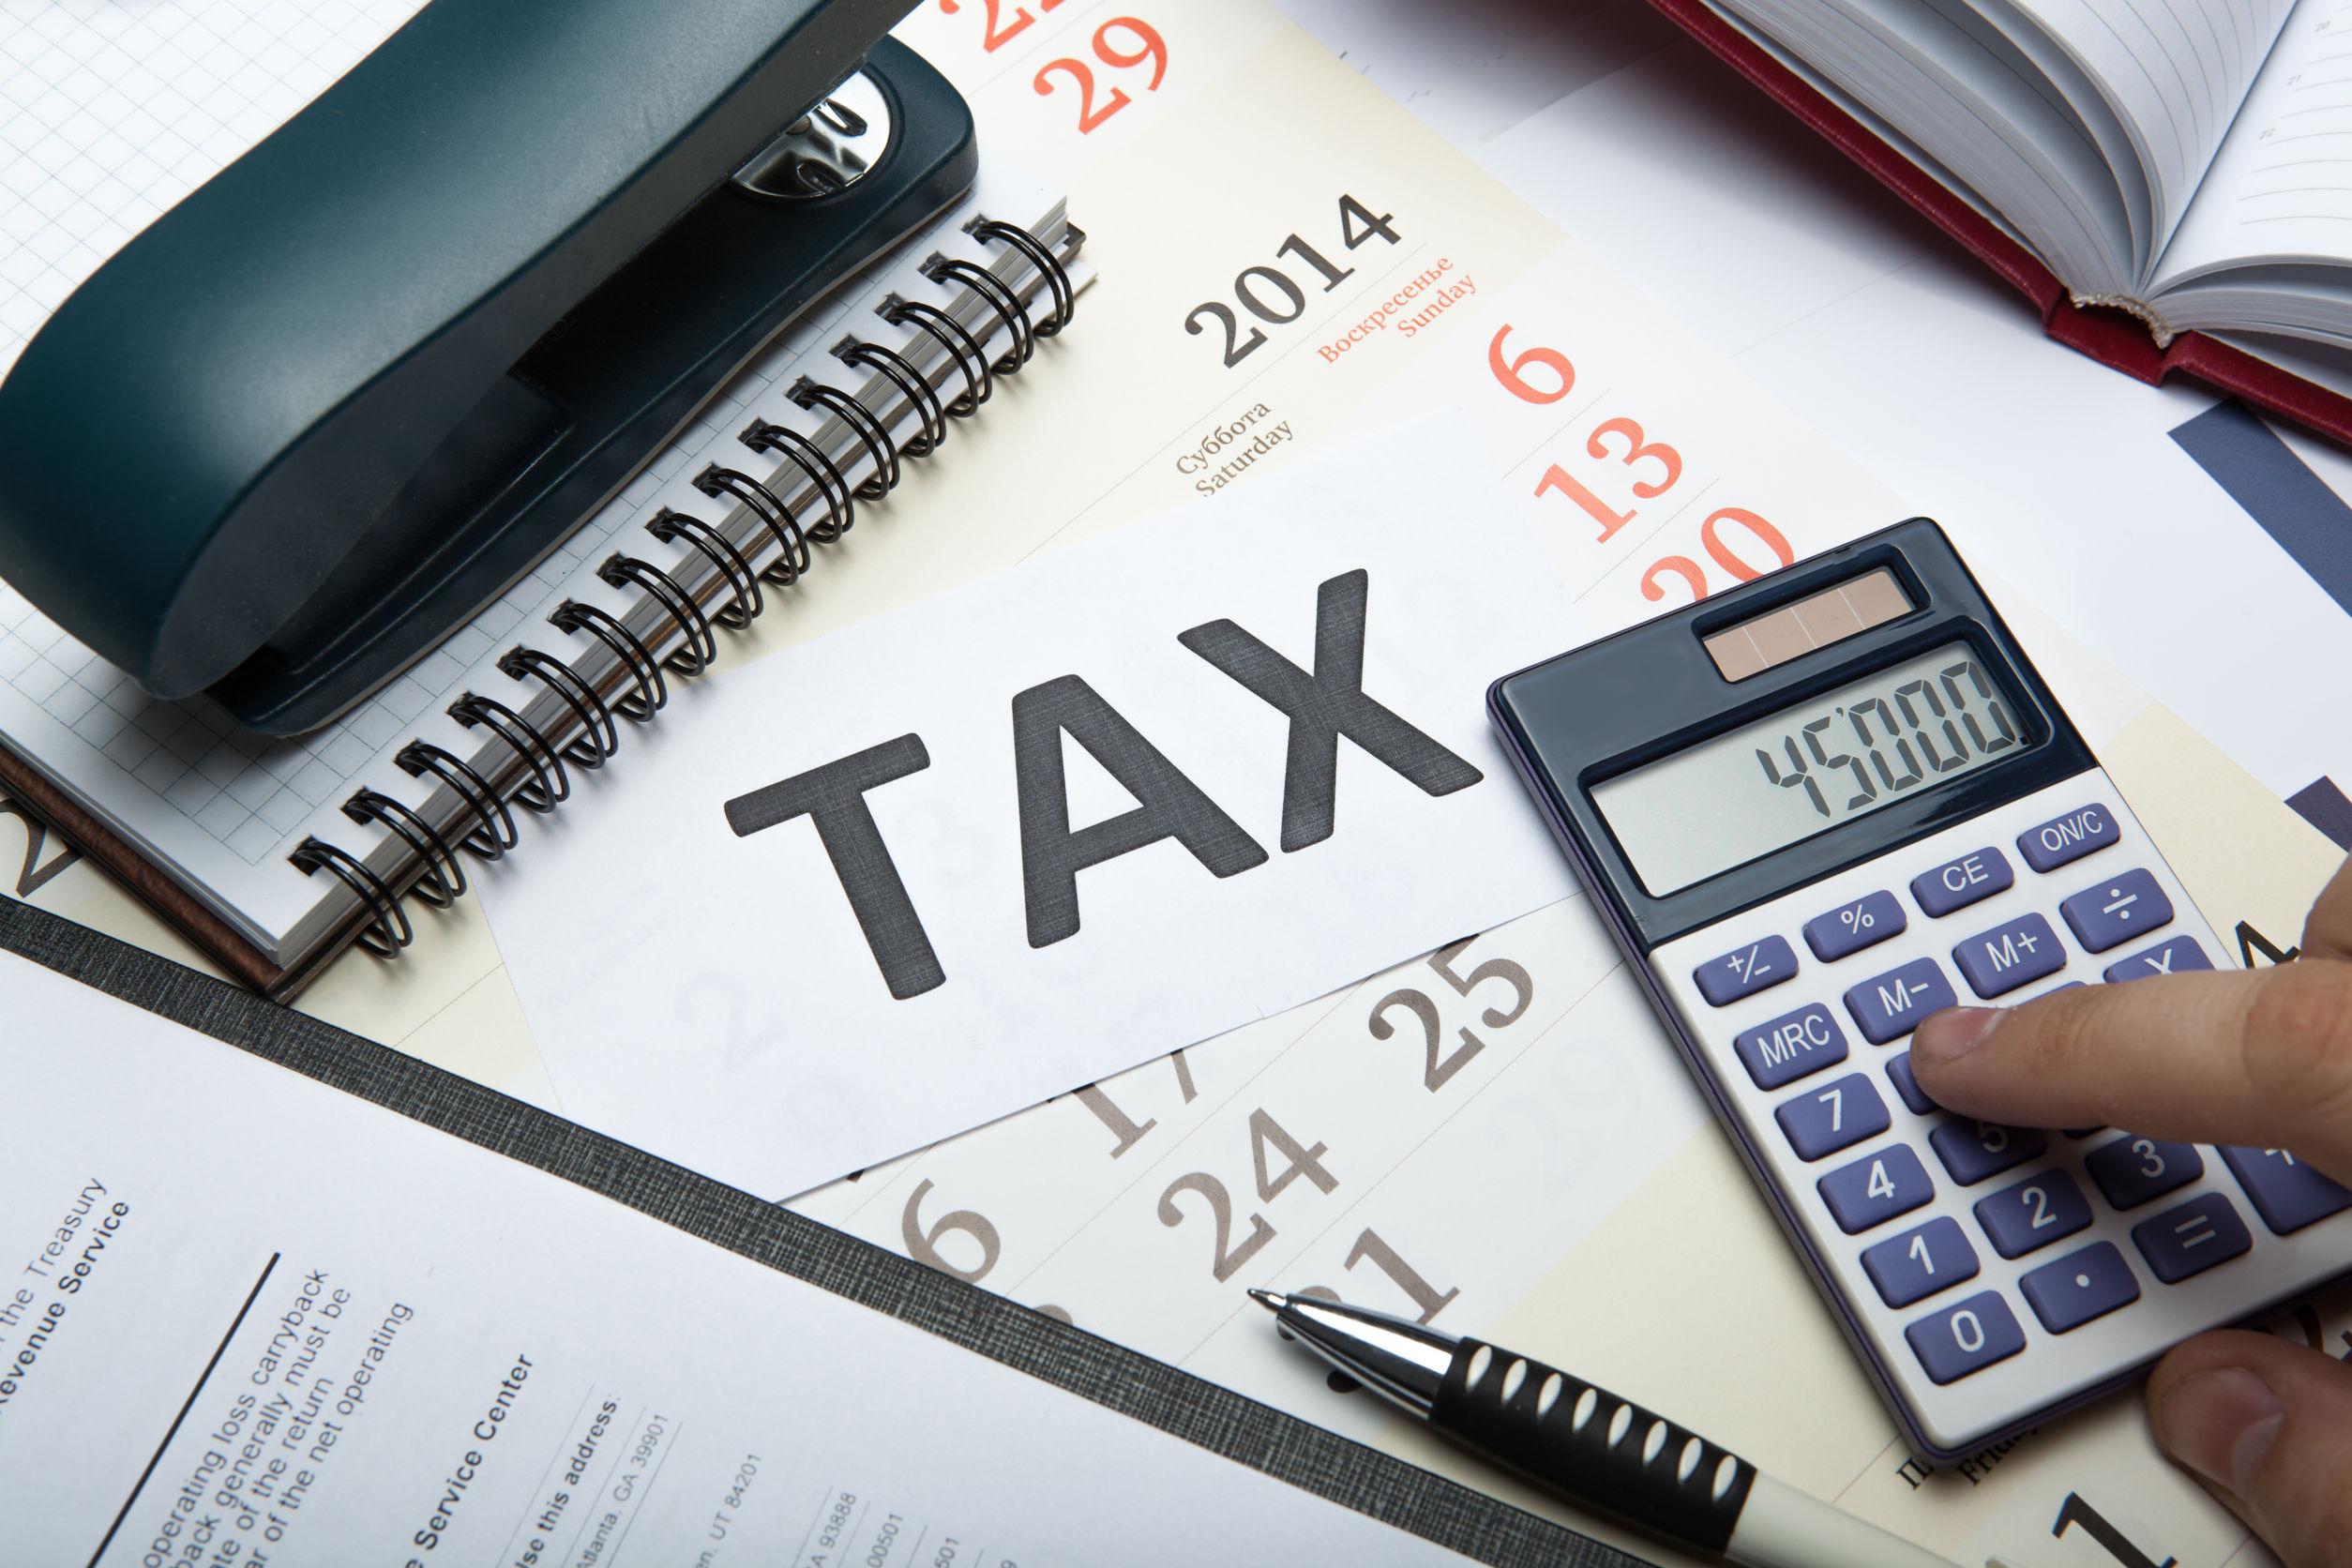 Tax Amnesty Jilid II Dinilai Berpotensi Turunkan Kepatuhan Wajib Pajak –  PENGAMPUNAN PAJAK